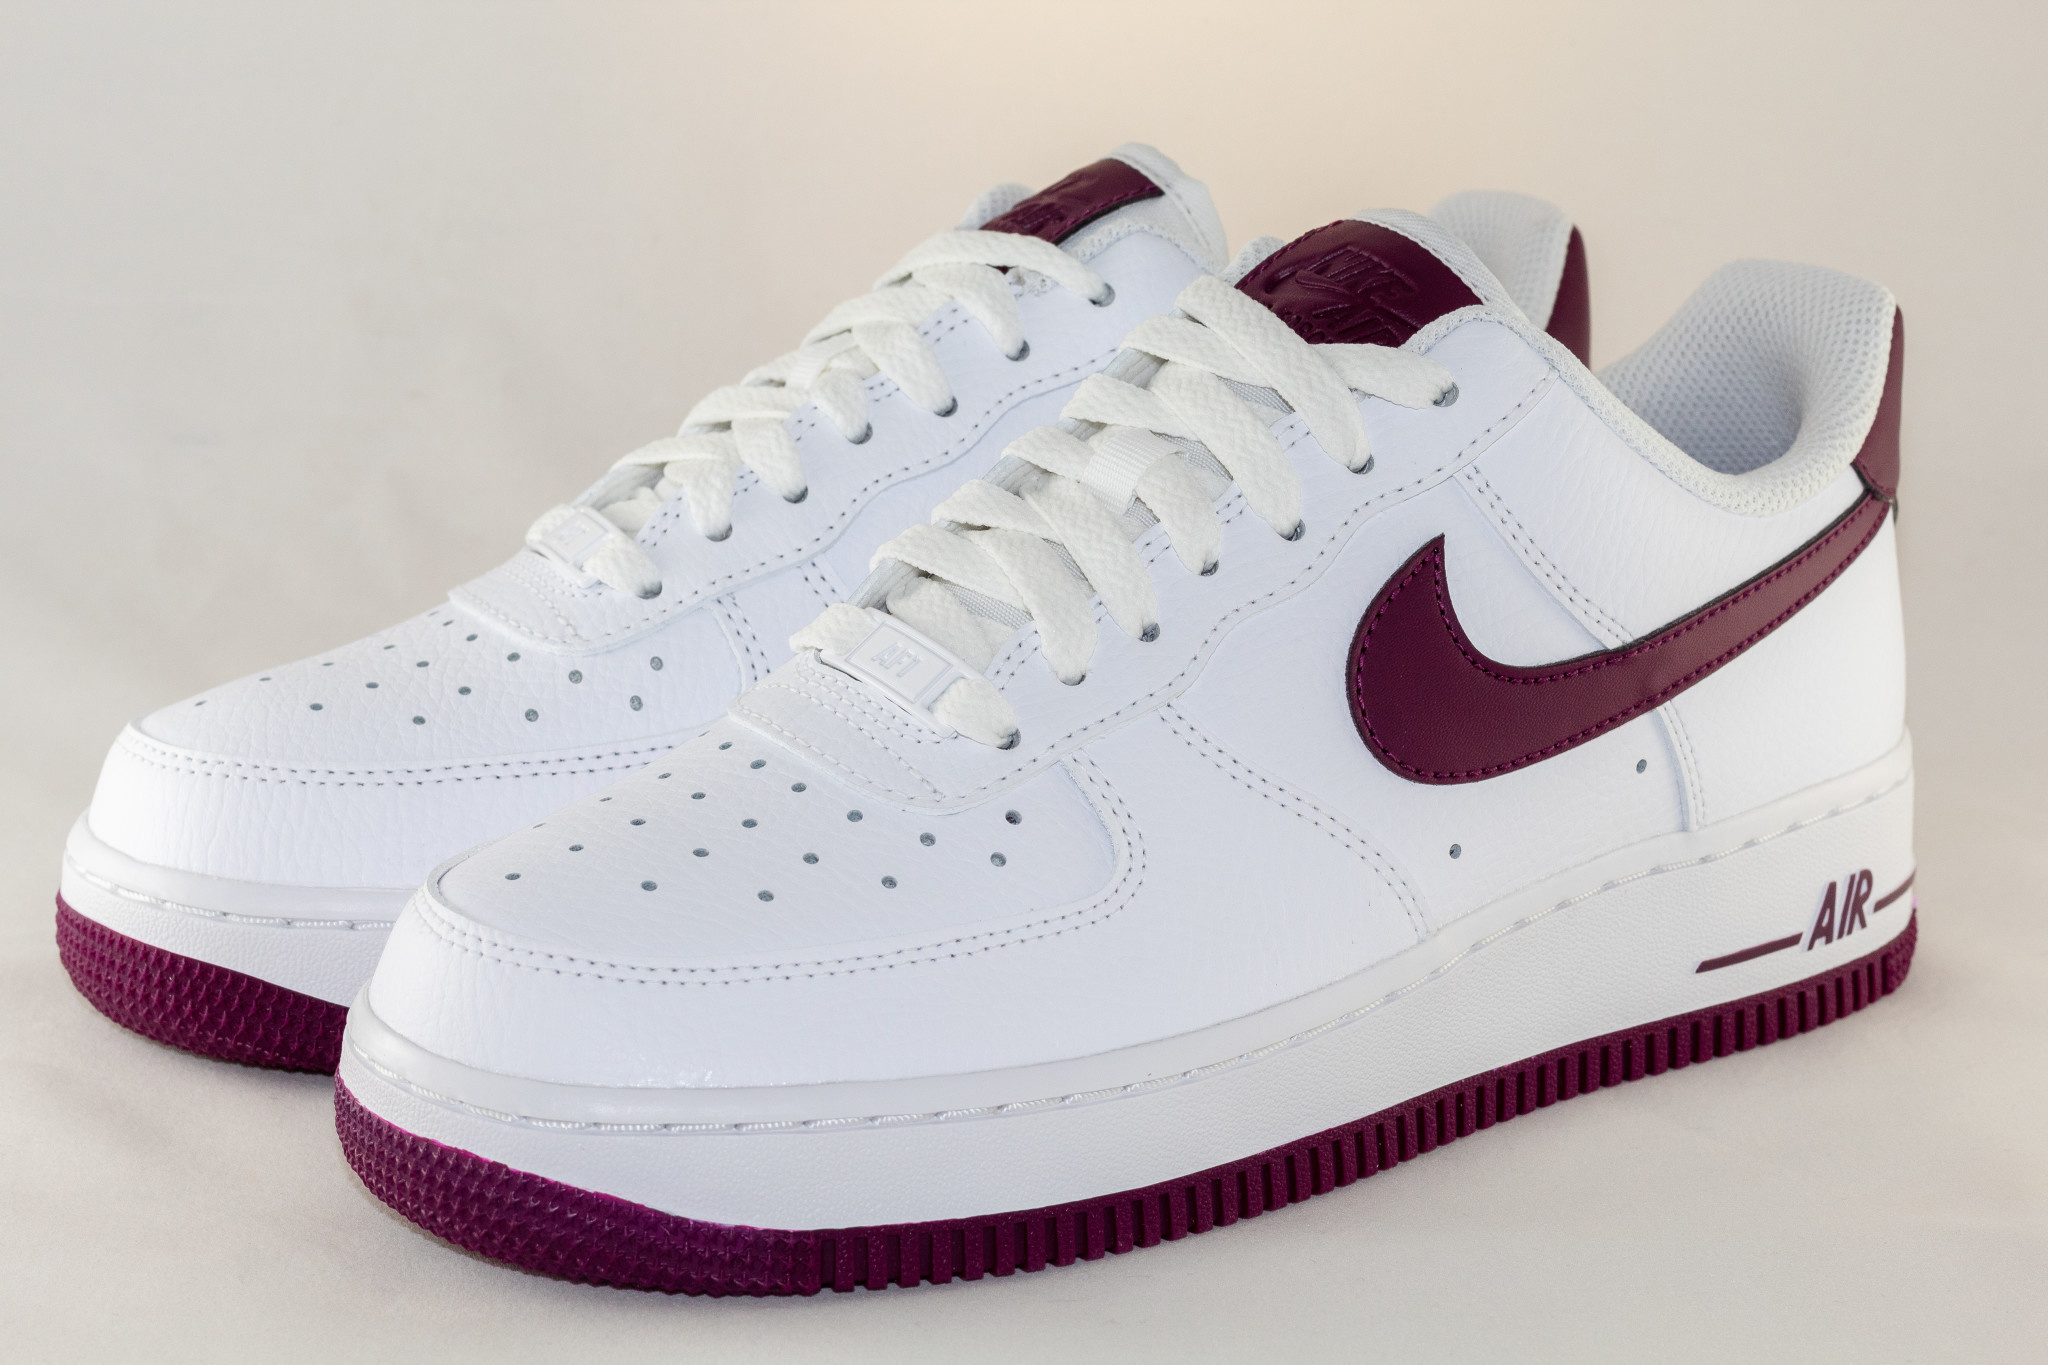 Nike NIKE WMNS AIR FORCE 1 '07 White/Bordeaux